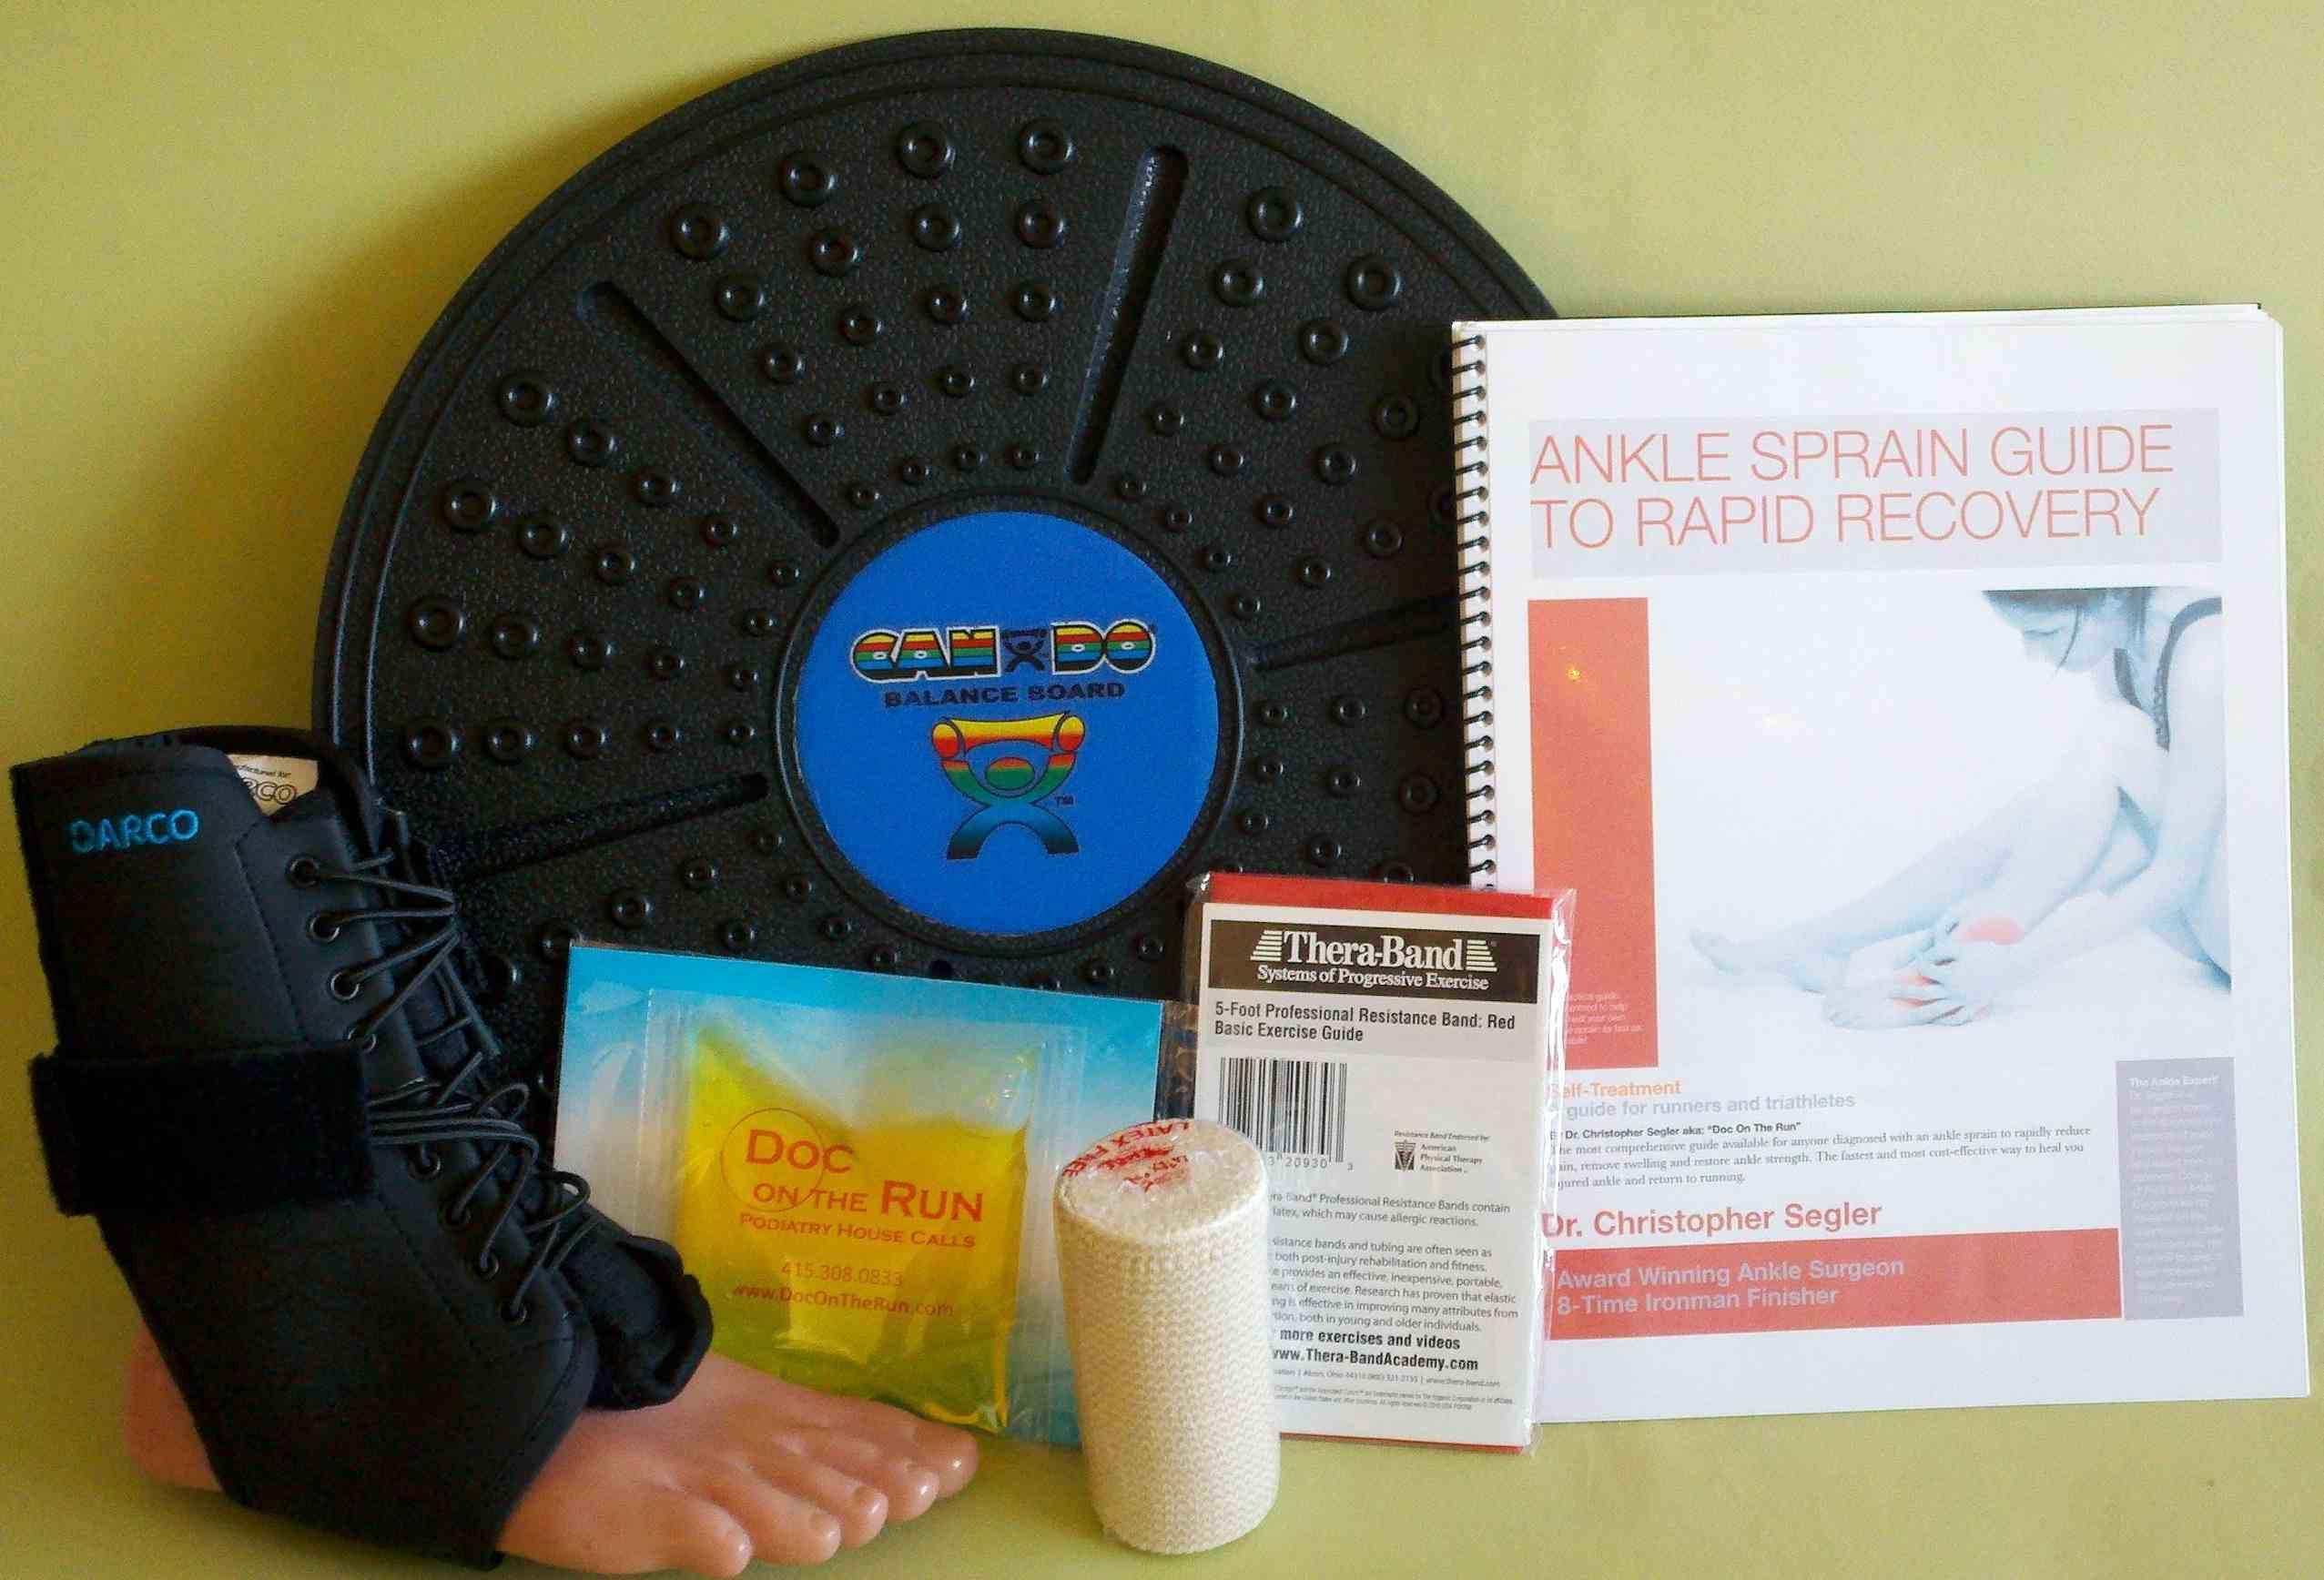 Ankle Sprain First Aid Grade 1 Self-Treatment Kit